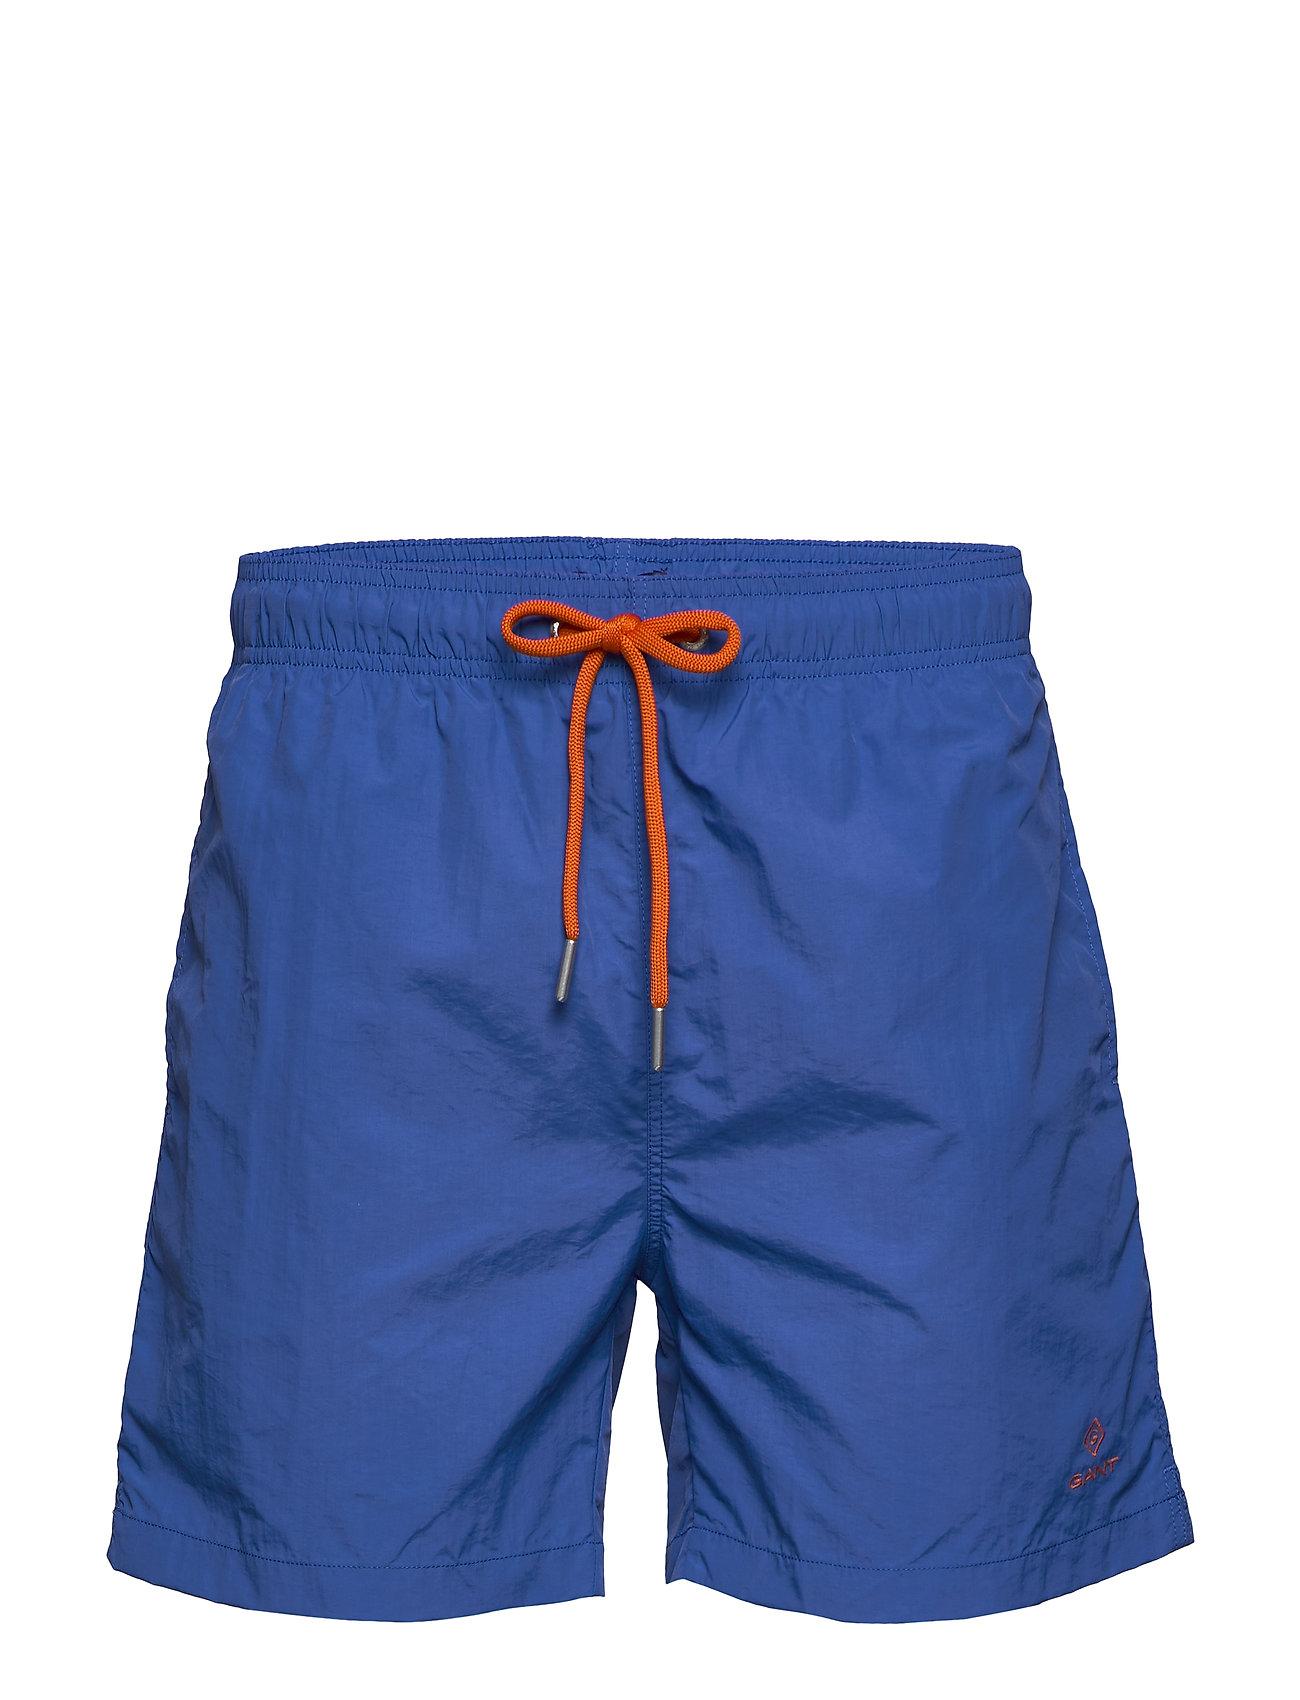 Gant BASIC SWIM SHORTS CLASSIC FIT - NAUTICAL BLUE